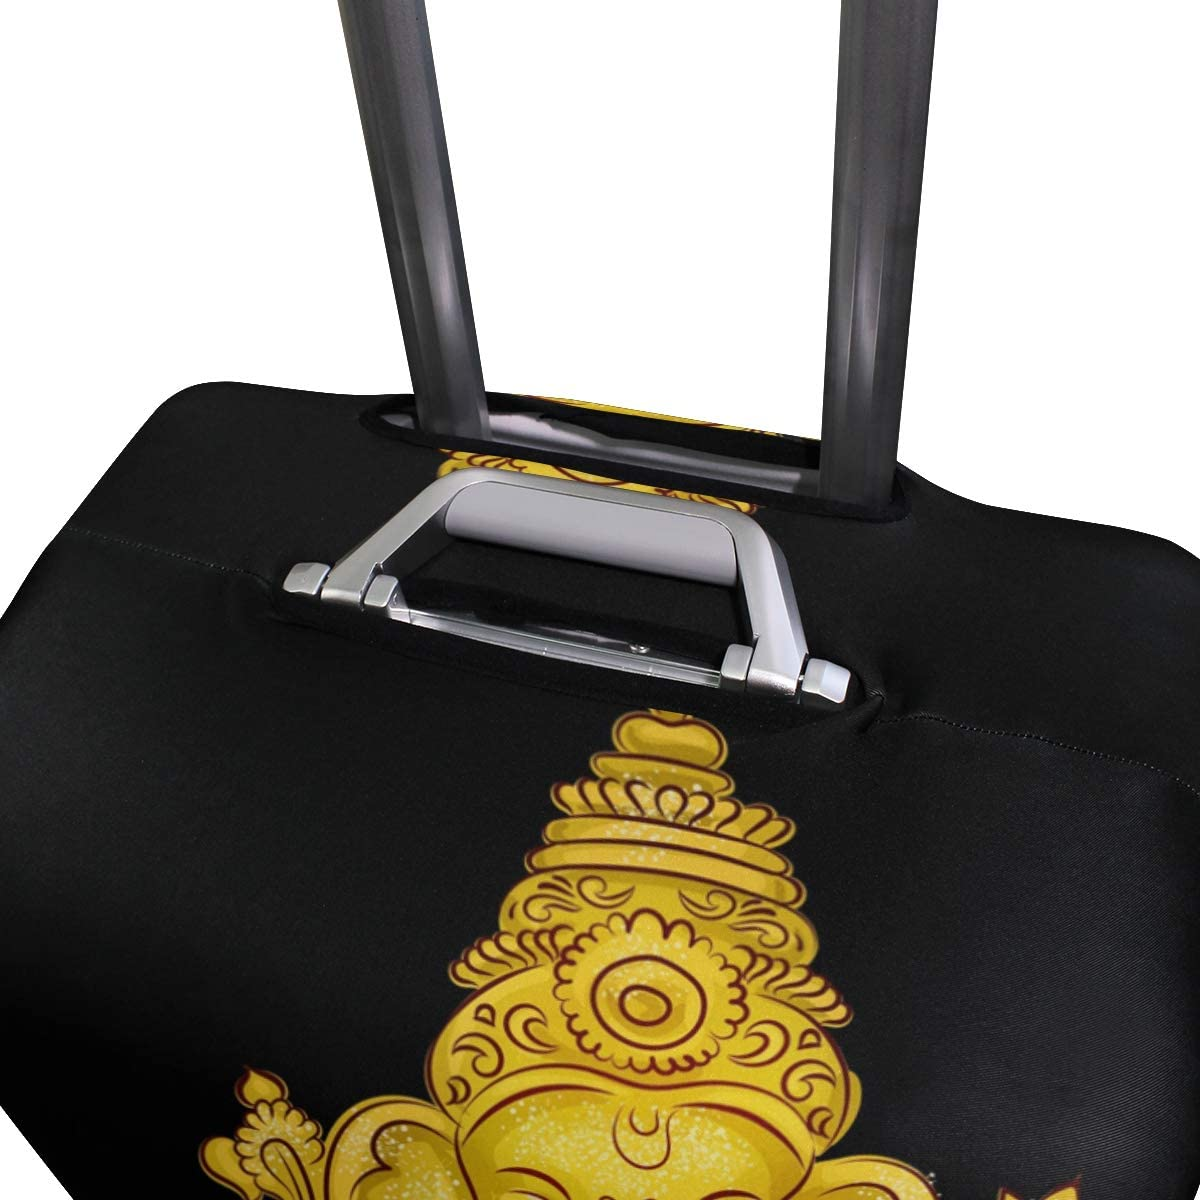 GIOVANIOR Thai Cartoon Elephant Luggage Cover Suitcase Protector Carry On Covers